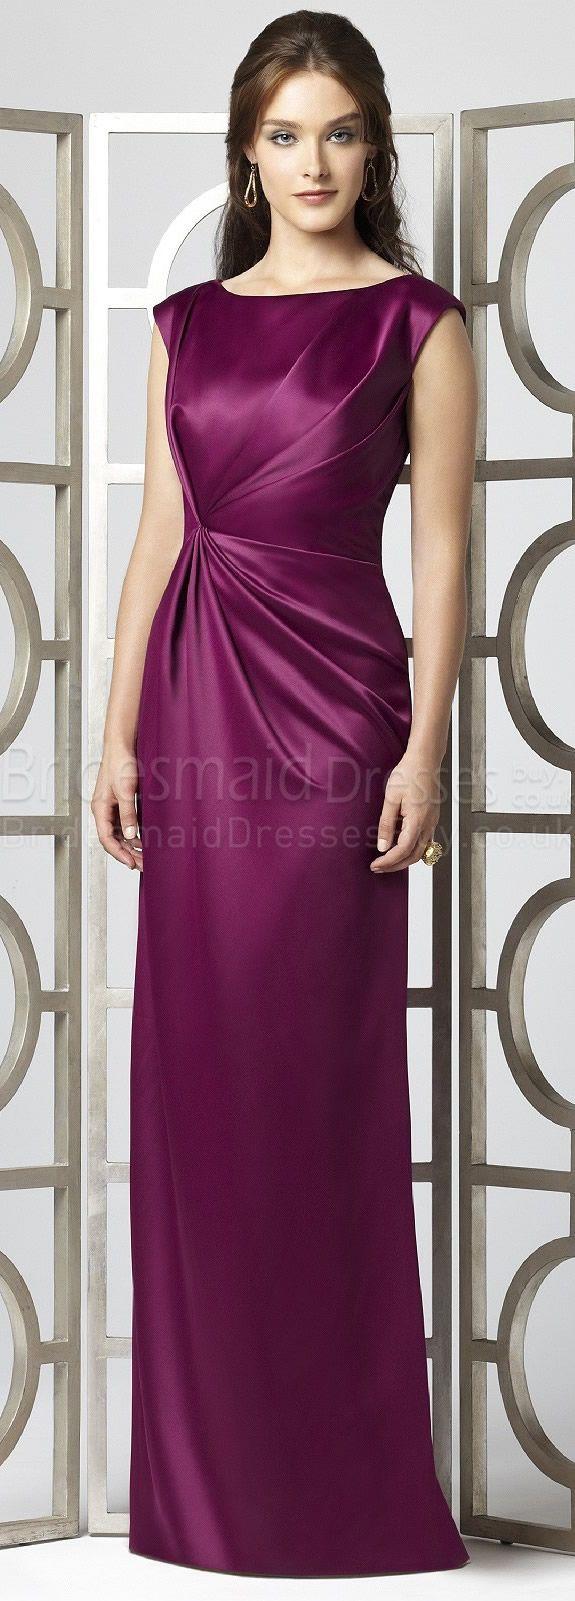 long purple bridesmaid dresses,long purple bridesmaid dresses | PROM ...